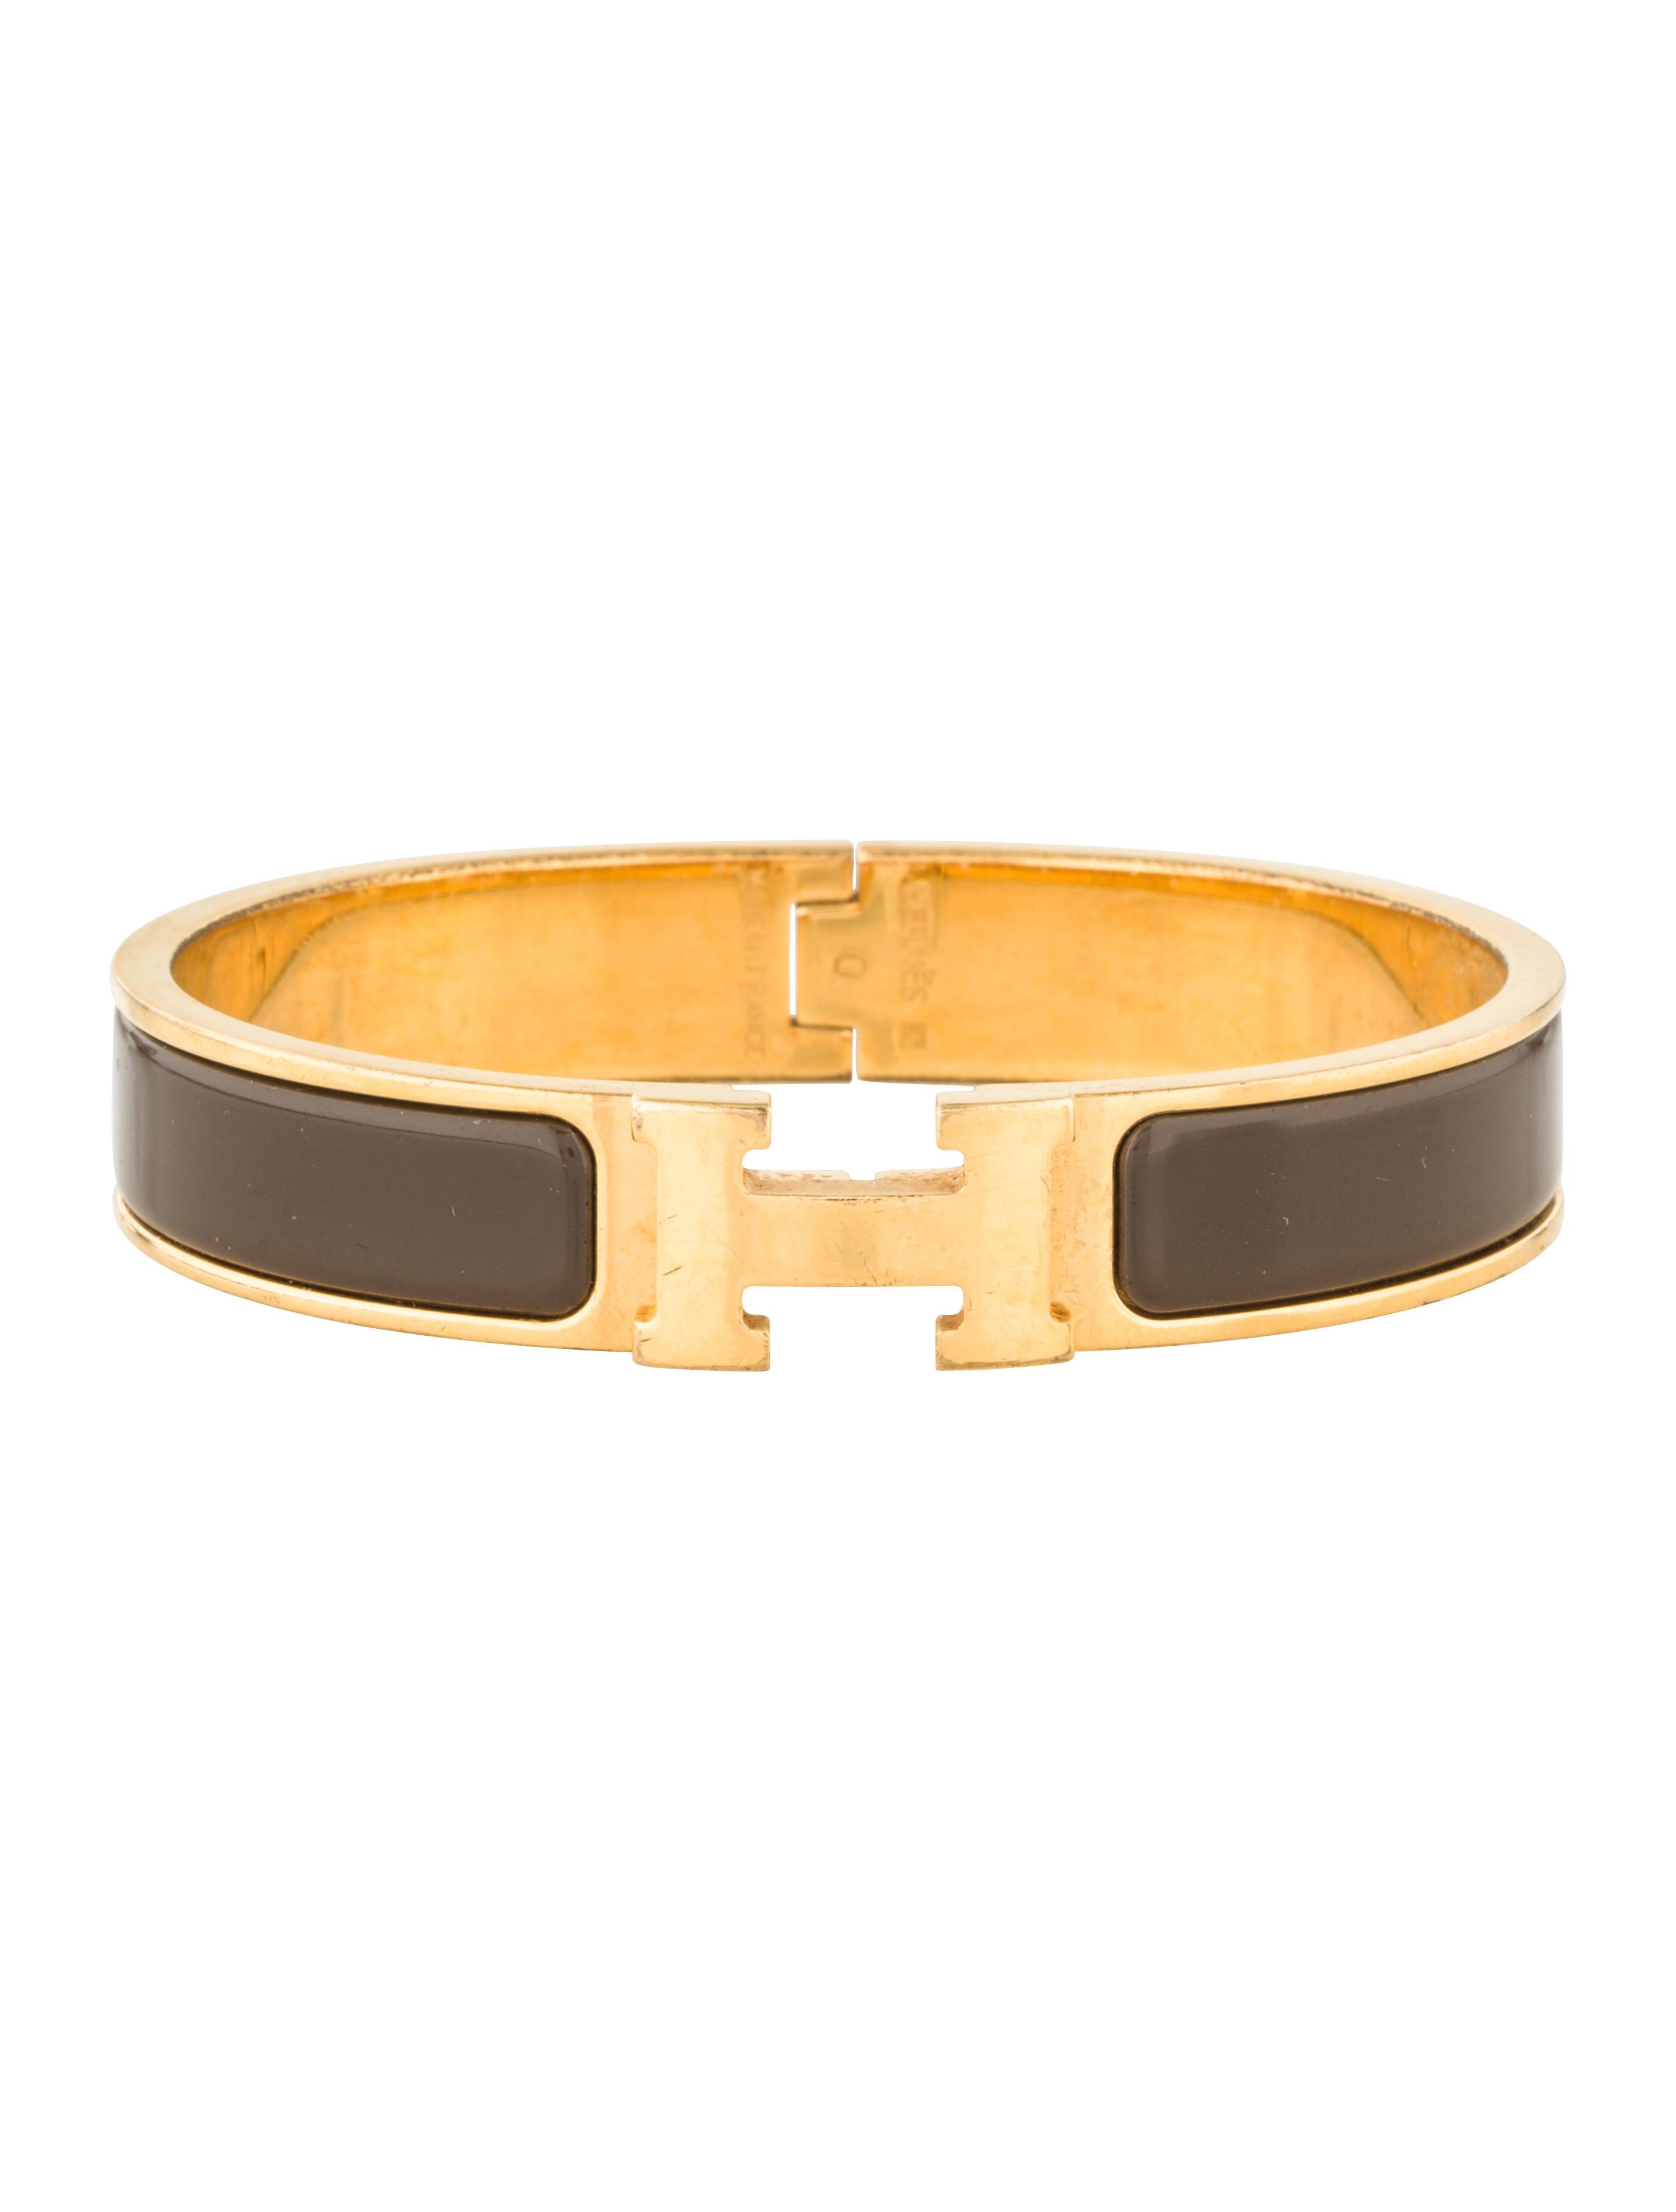 herm 232 s clic h bracelet bracelets her93833 the realreal